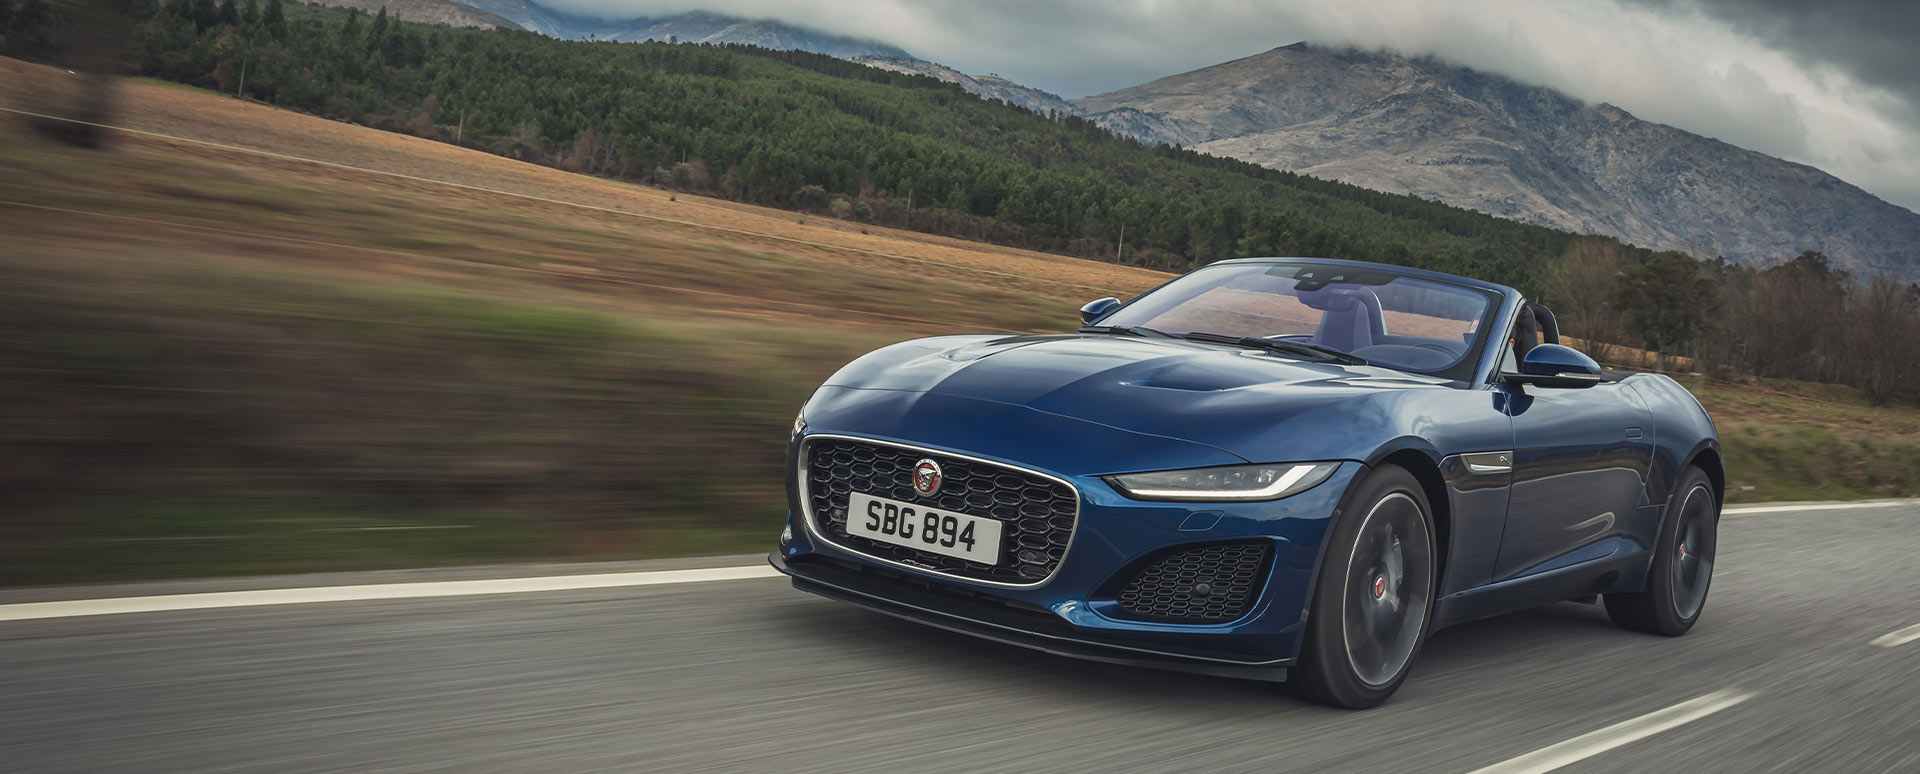 Blue Jaguar F-TYPE Convertible, driving